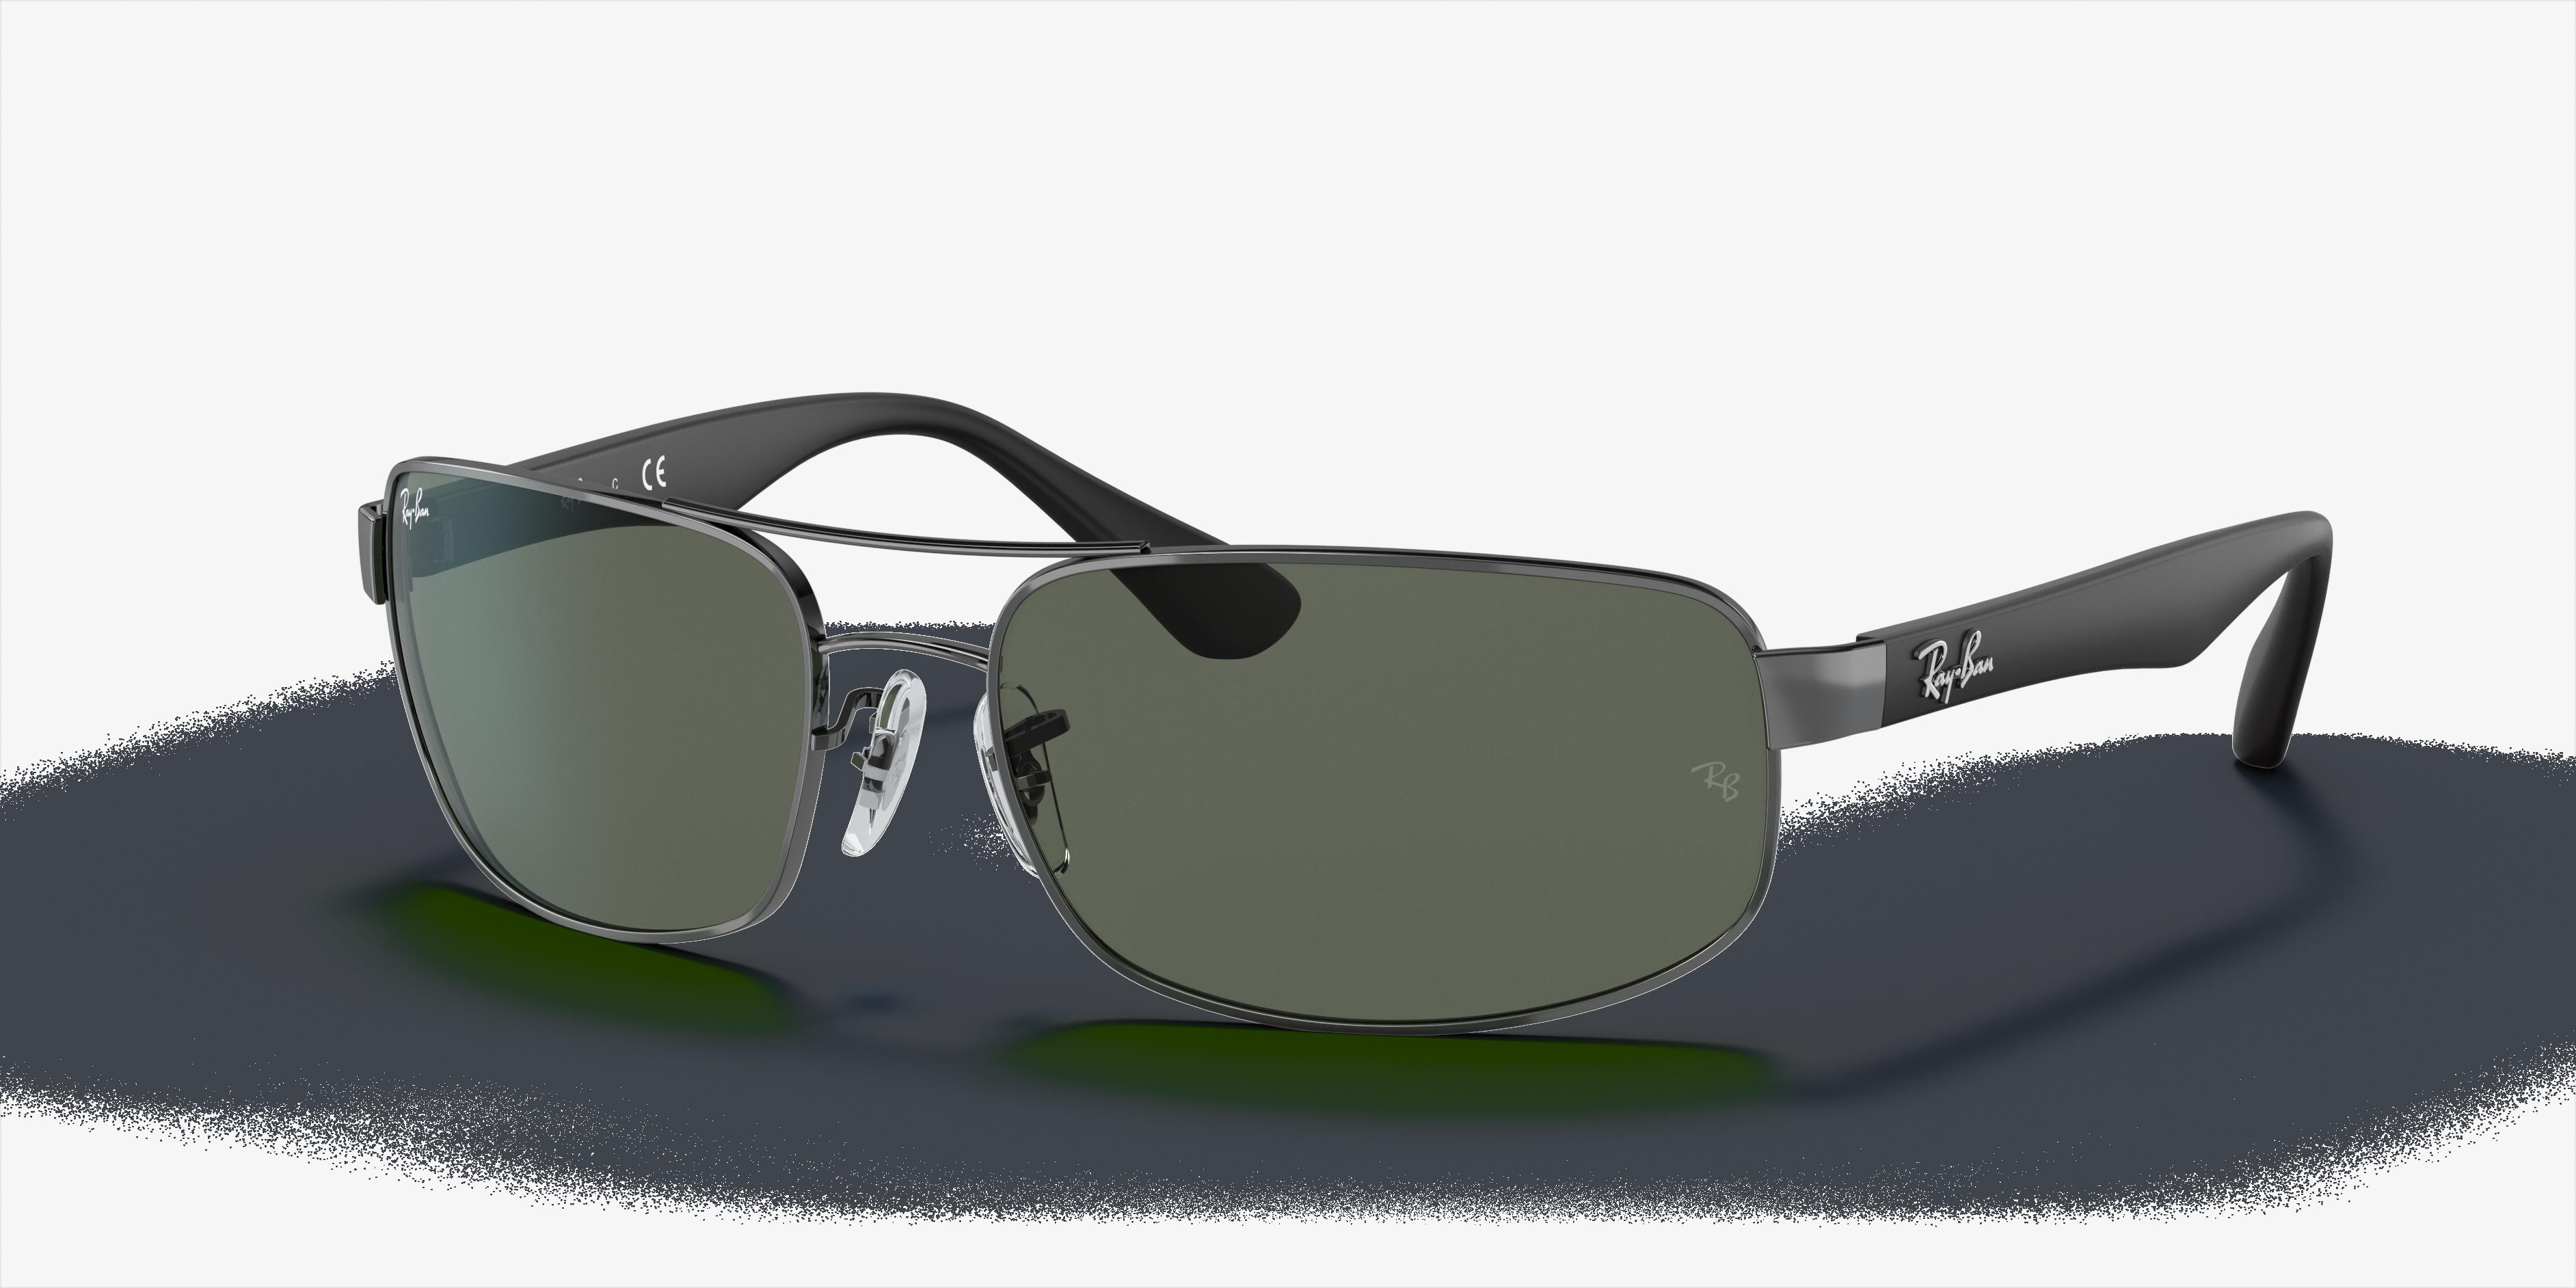 Ray-Ban Rb3445 Black, Green Lenses - RB3445